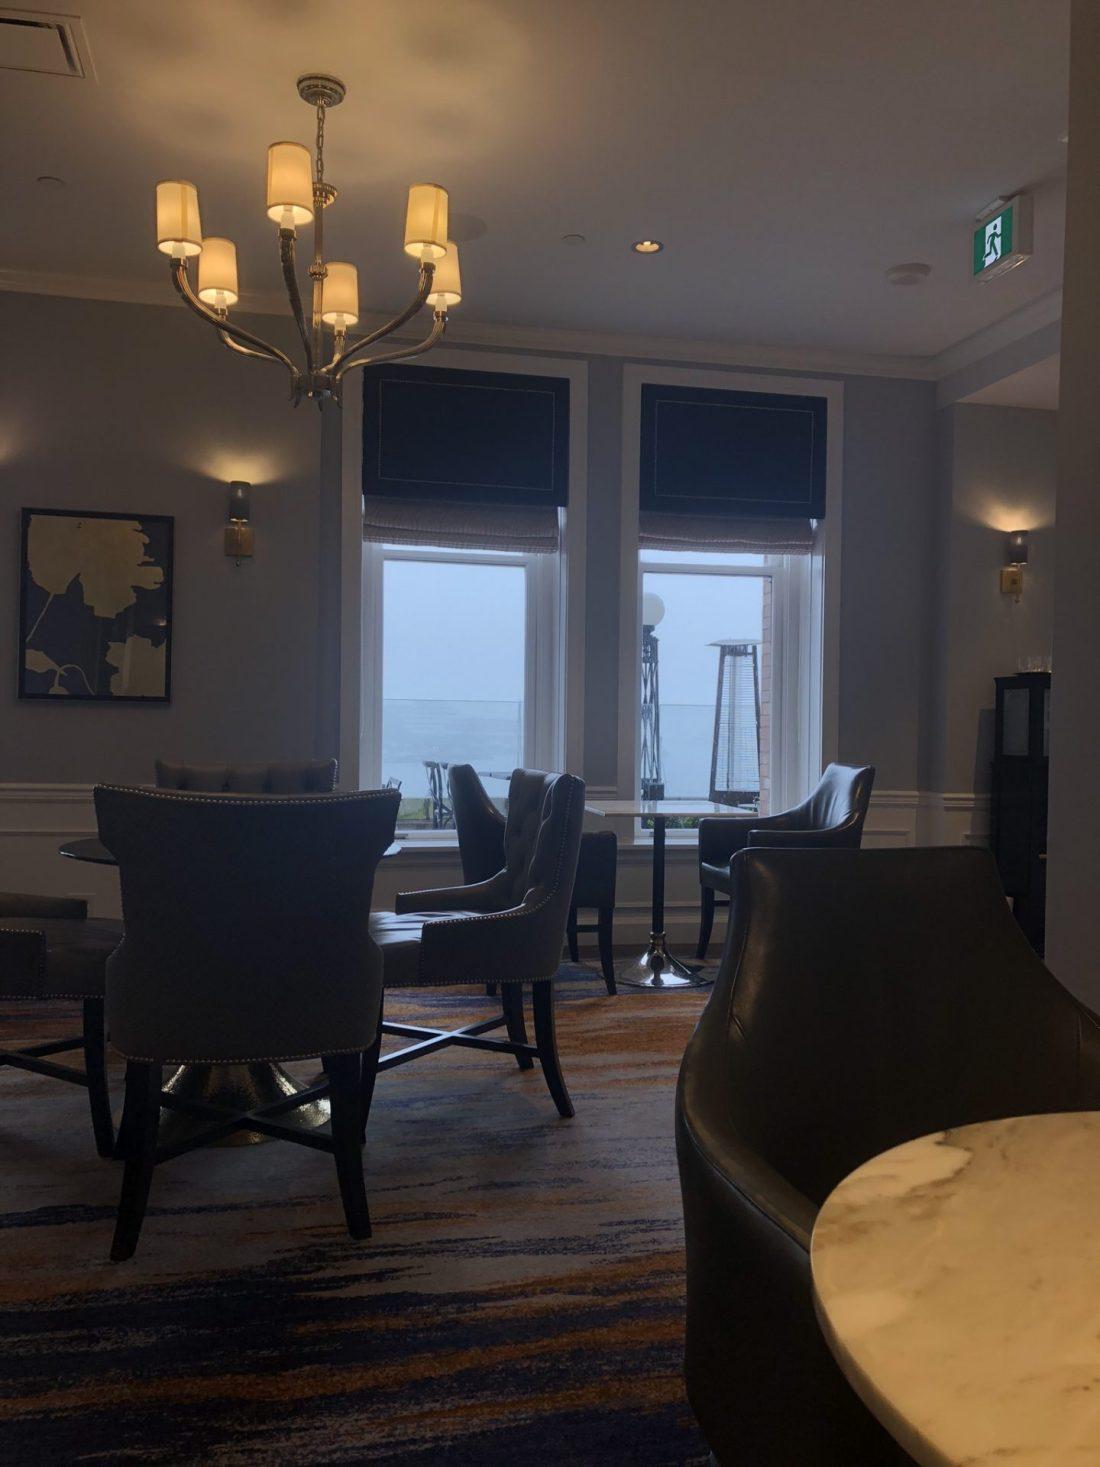 The Fairmont Gold Lounge in Victoria, British Columbia